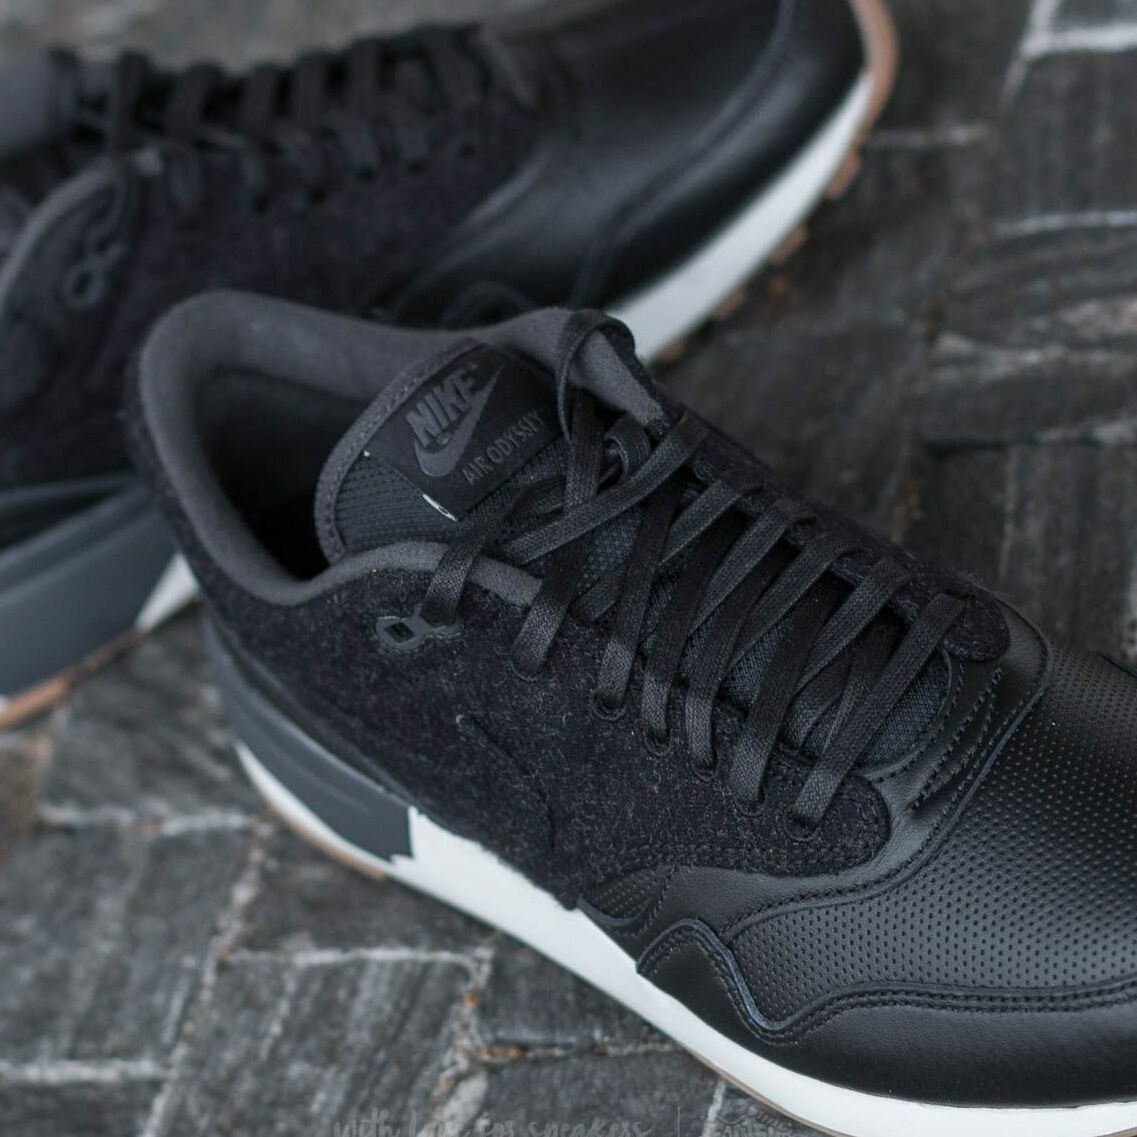 Nike Air Odyssey LX Black/ Black-Anthracite-Summit EUR 42